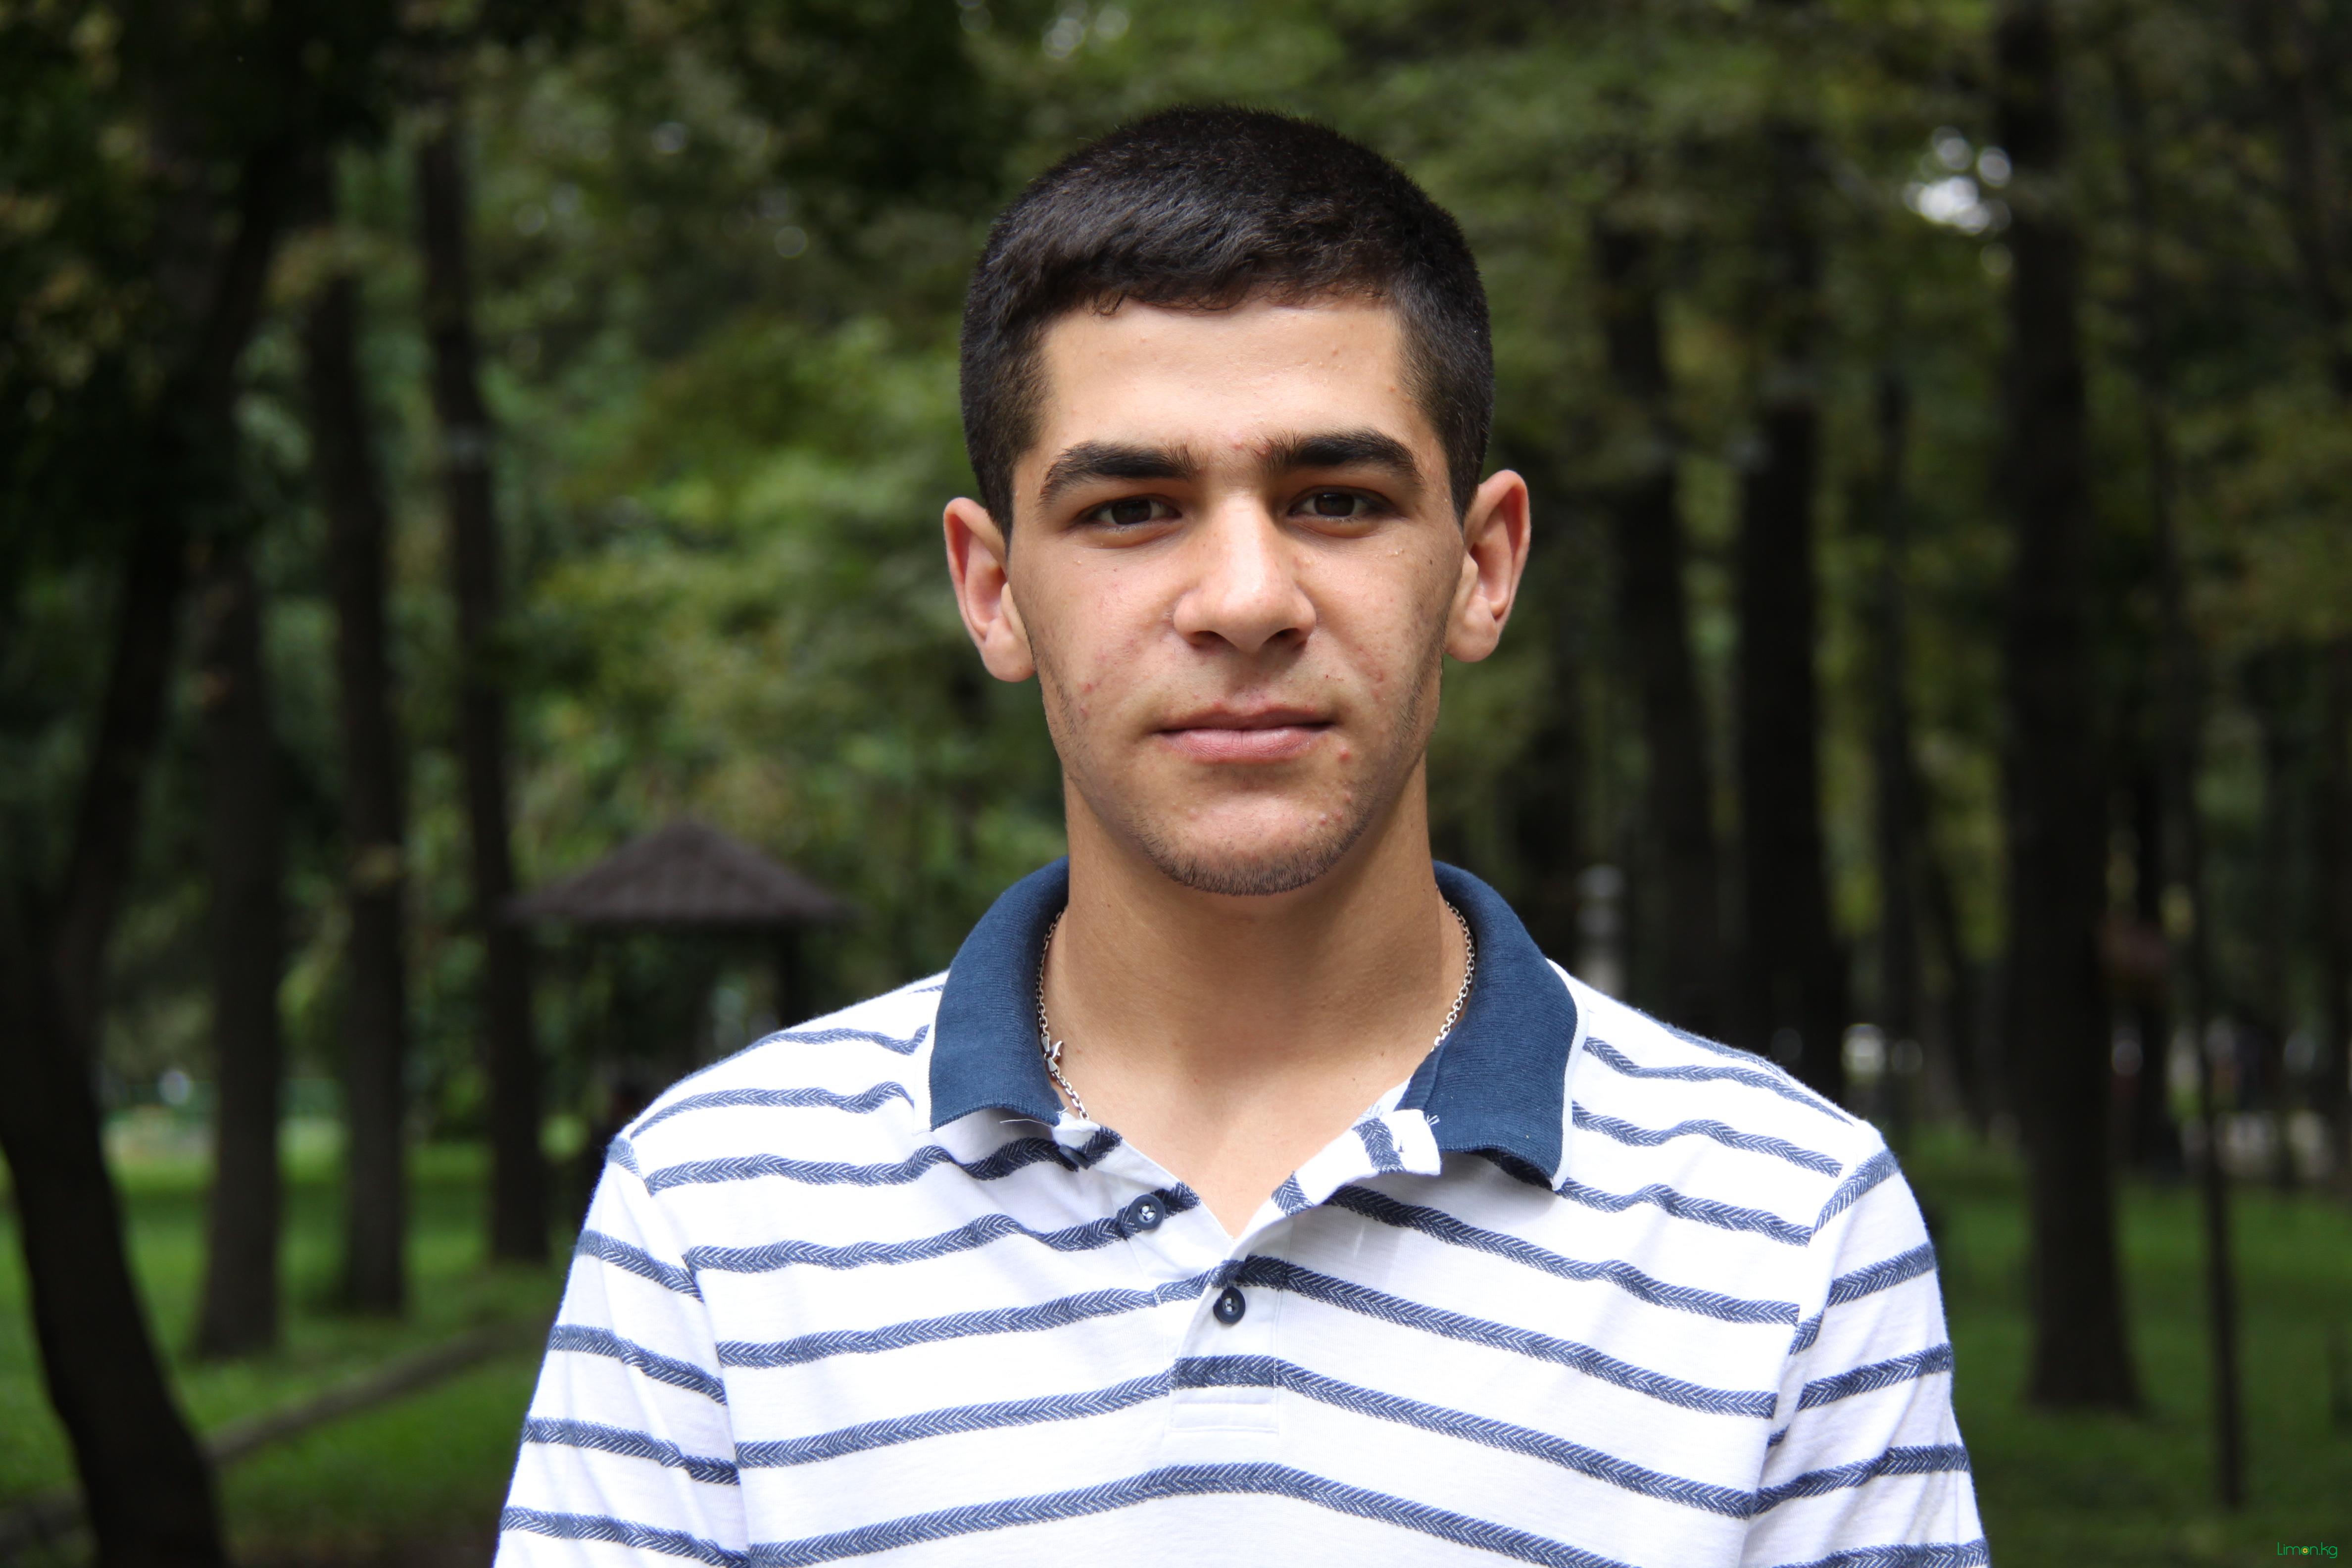 Амирхан Джалил заде, 20, студент